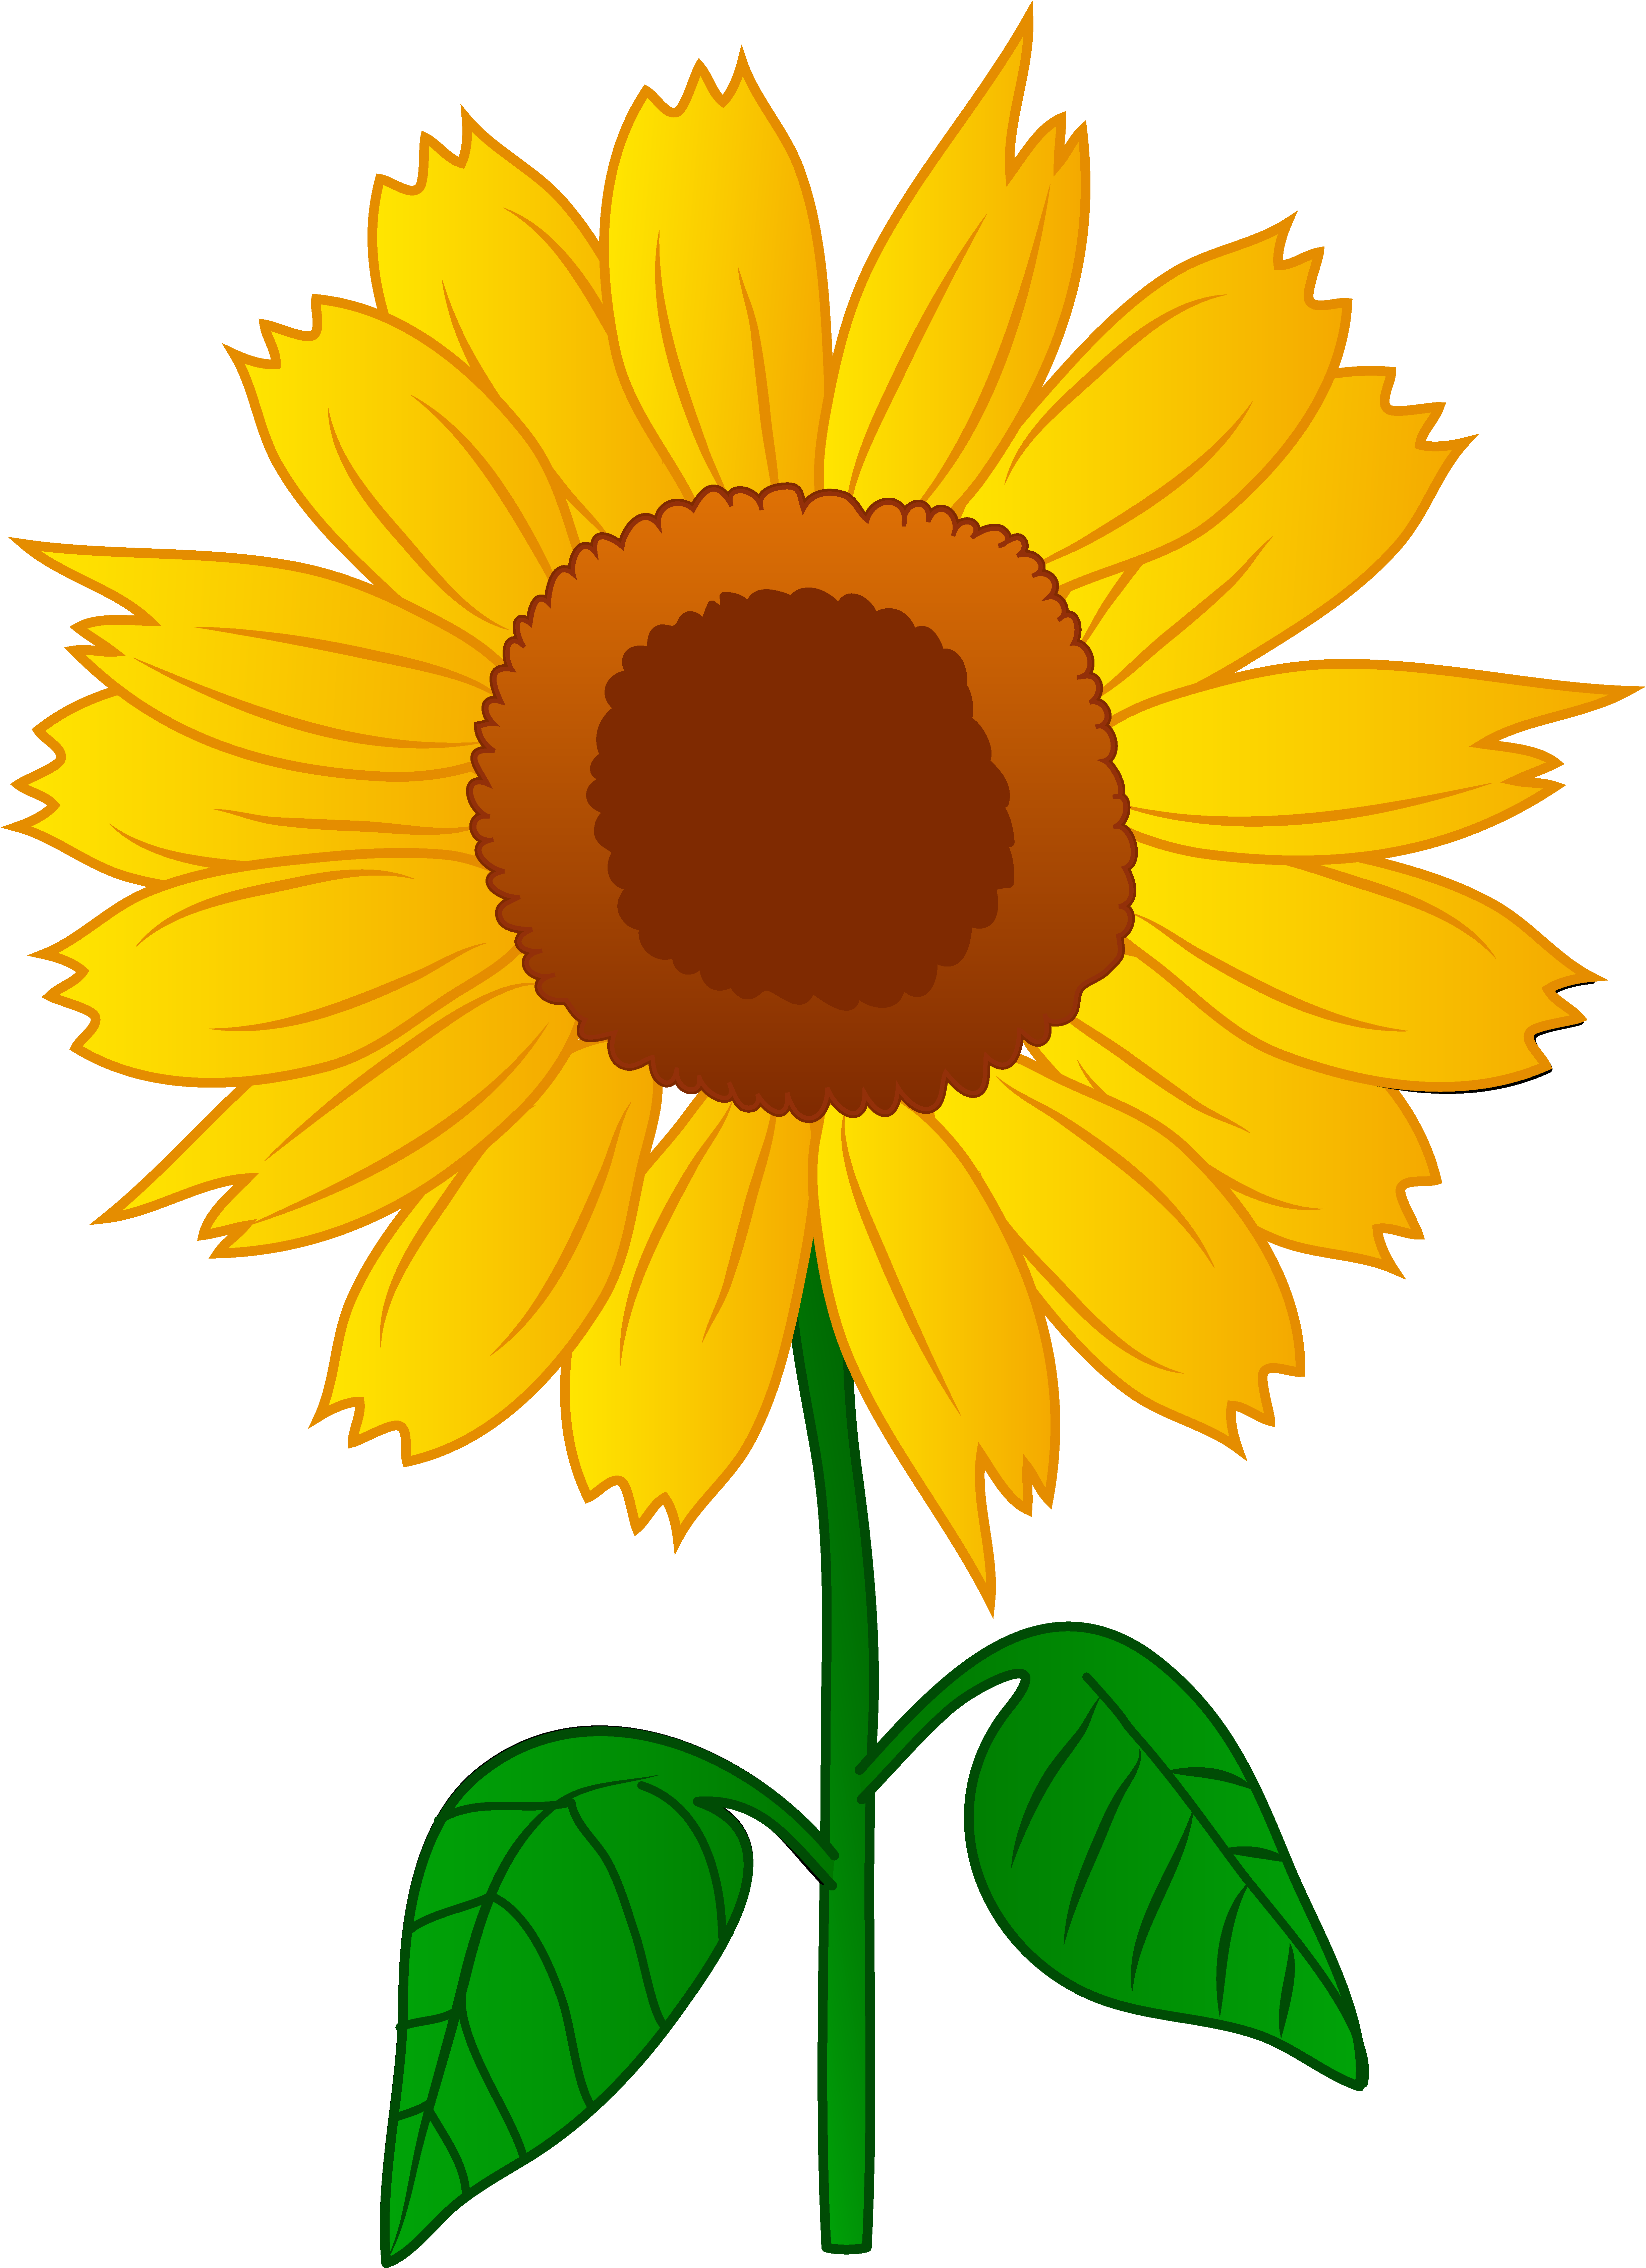 Cute sun with shades cartoon clipart clipart royalty free library Sun Border Clipart | Free download best Sun Border Clipart on ... clipart royalty free library